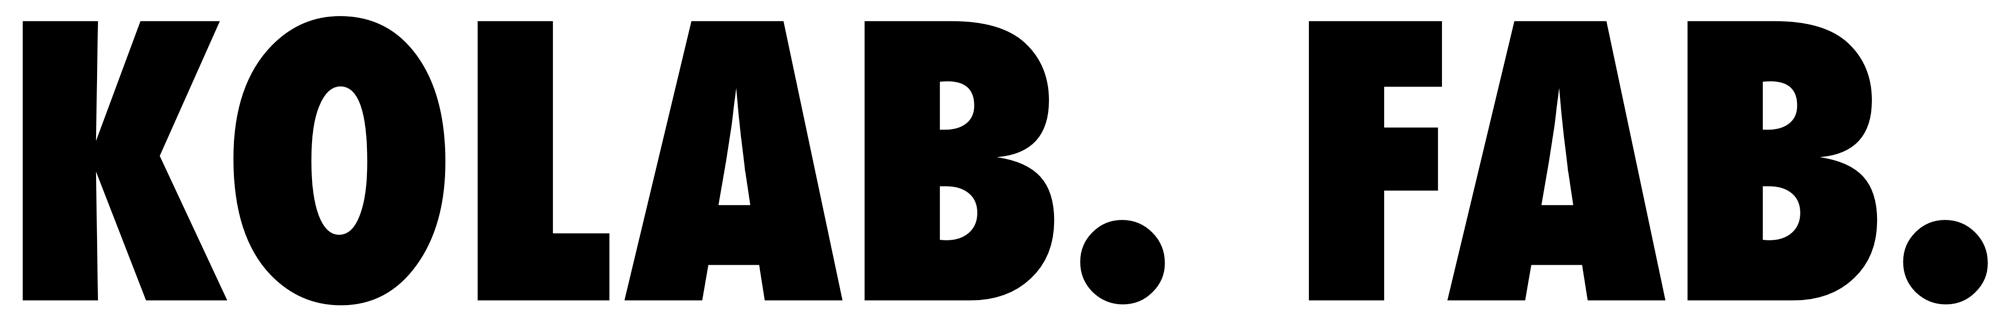 KOLAB FAB